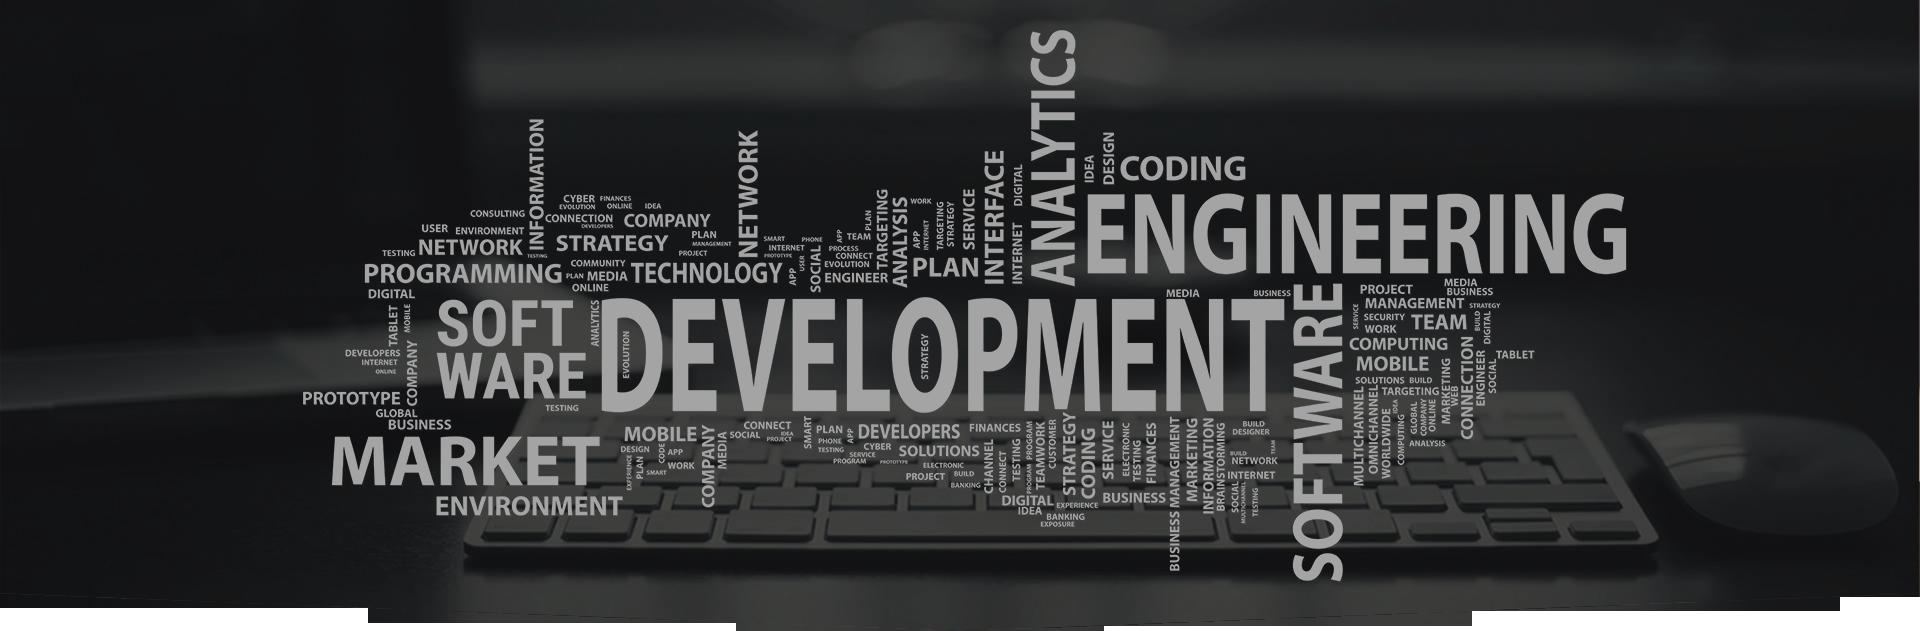 software_banner